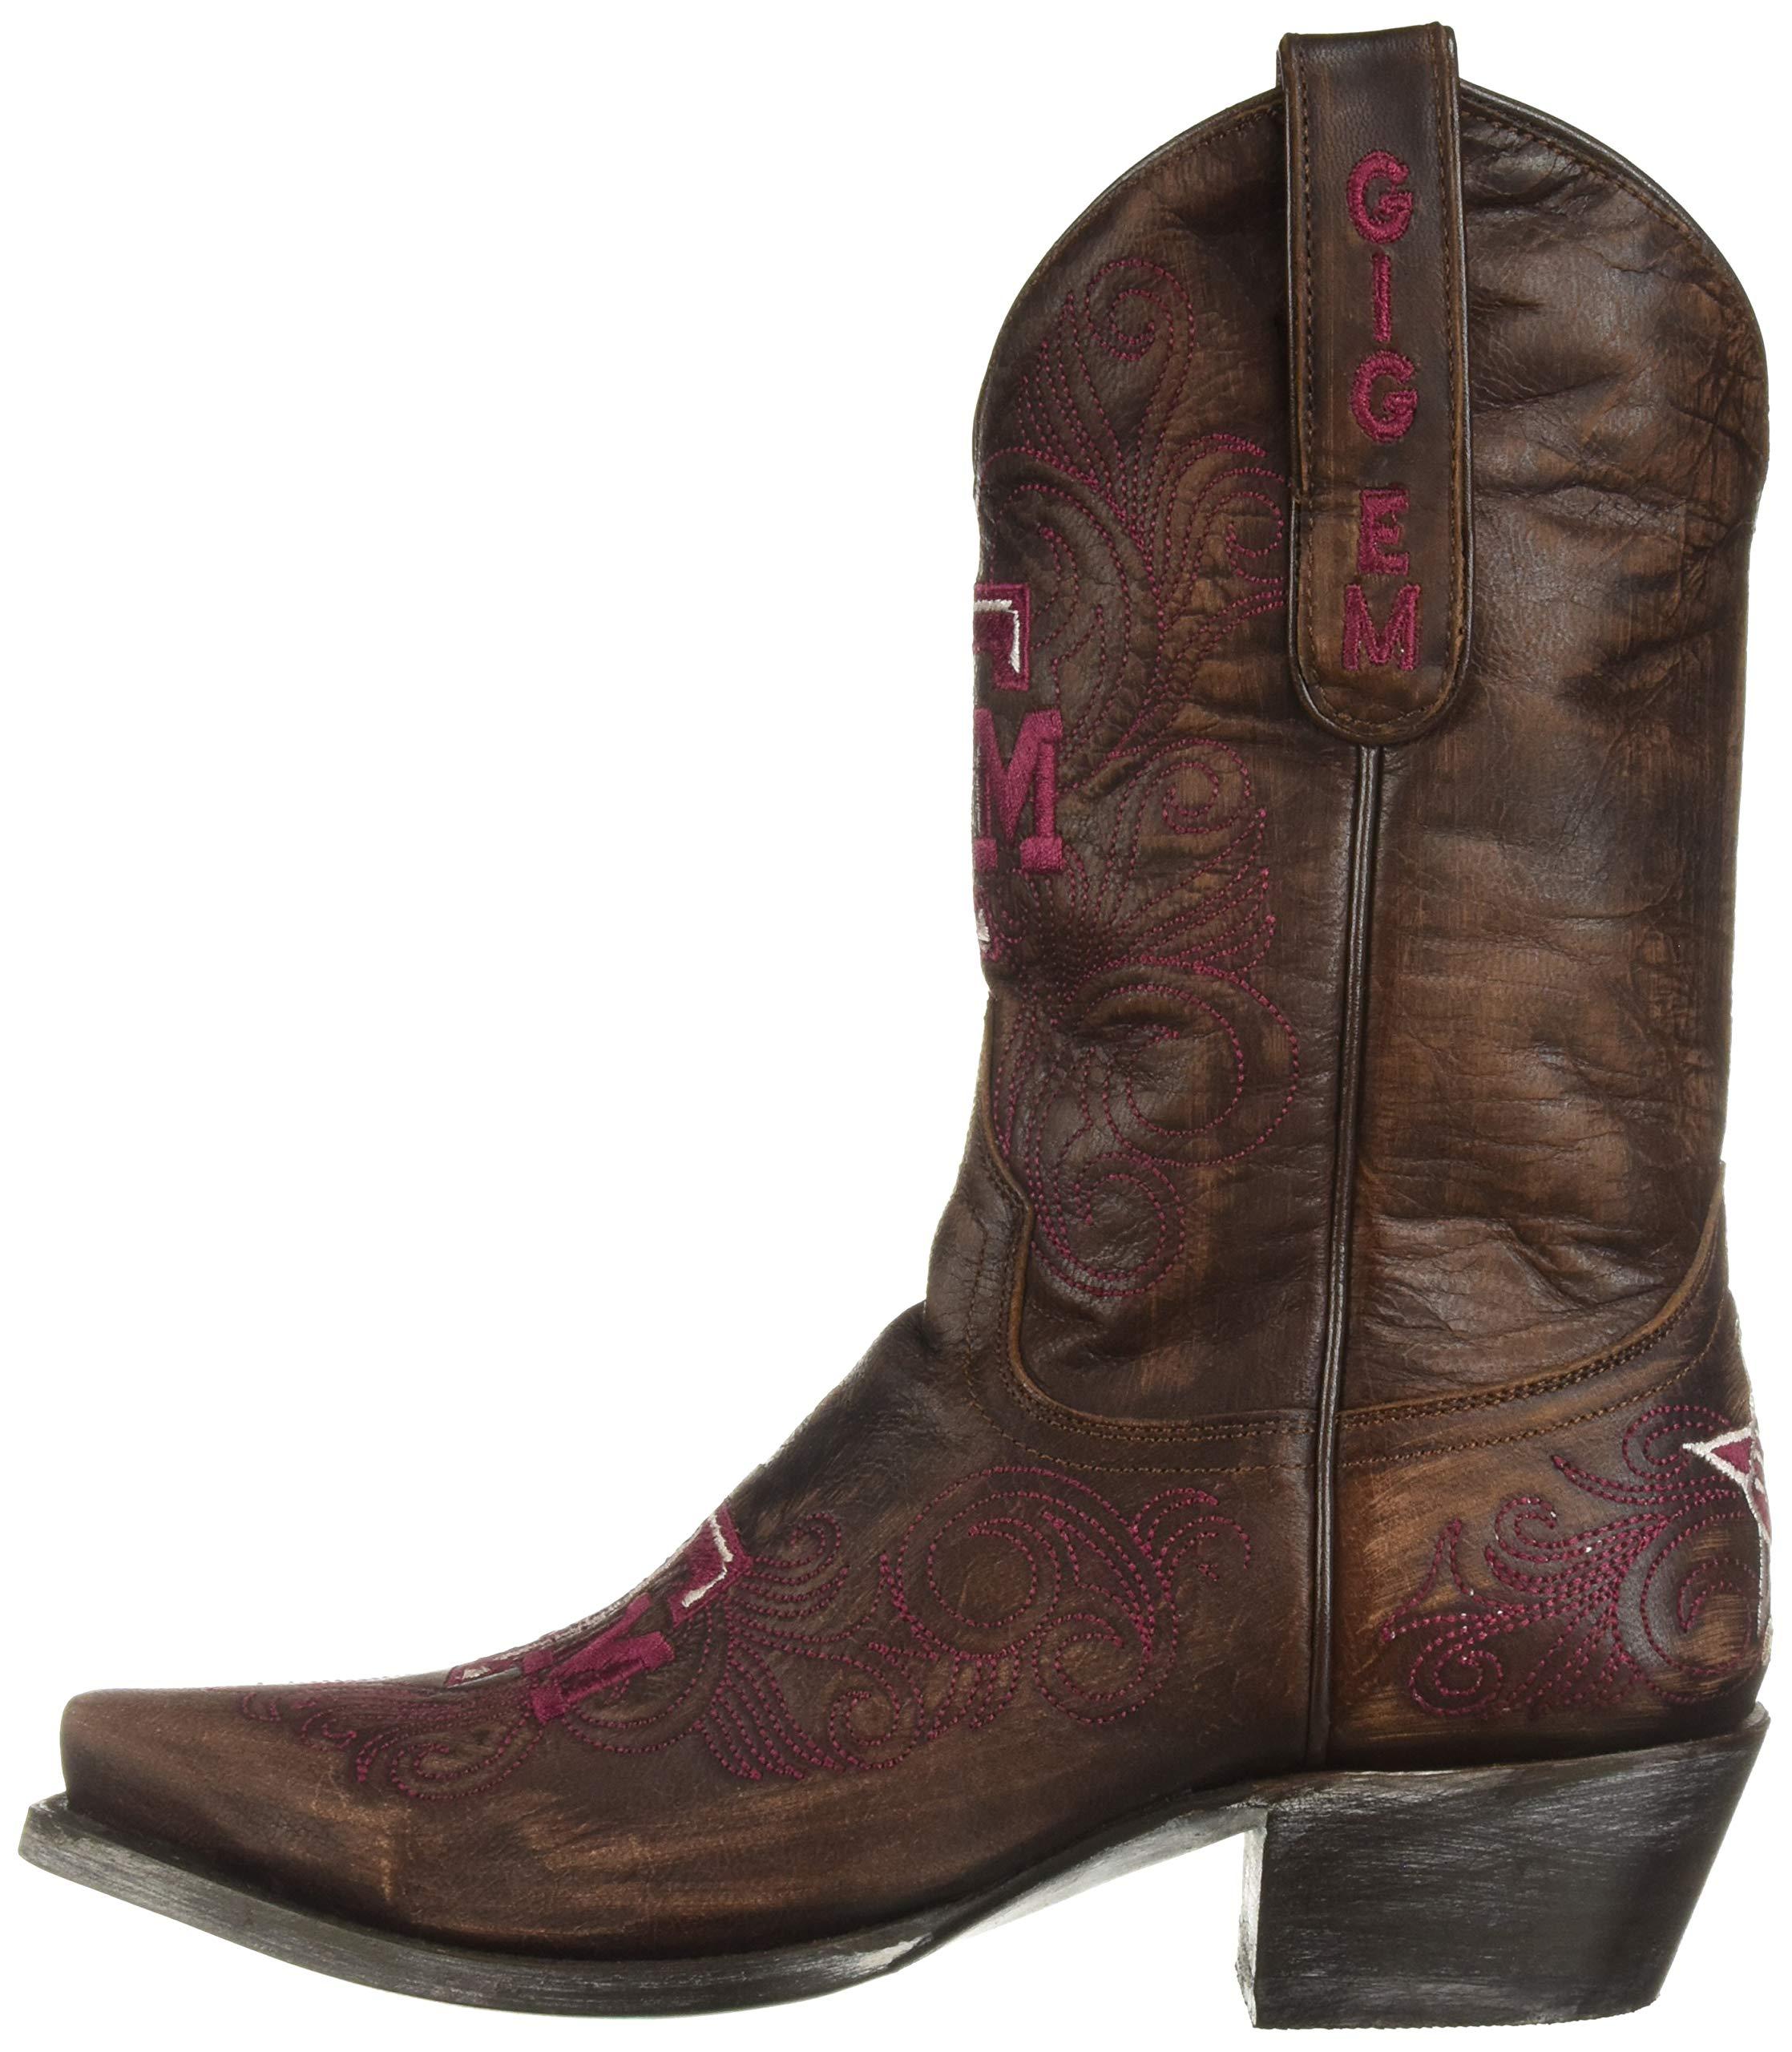 NCAA-Texas-A-amp-M-Aggies-Women-039-s-10-Inch-Gameday-Boot-Choose-SZ-color miniature 6